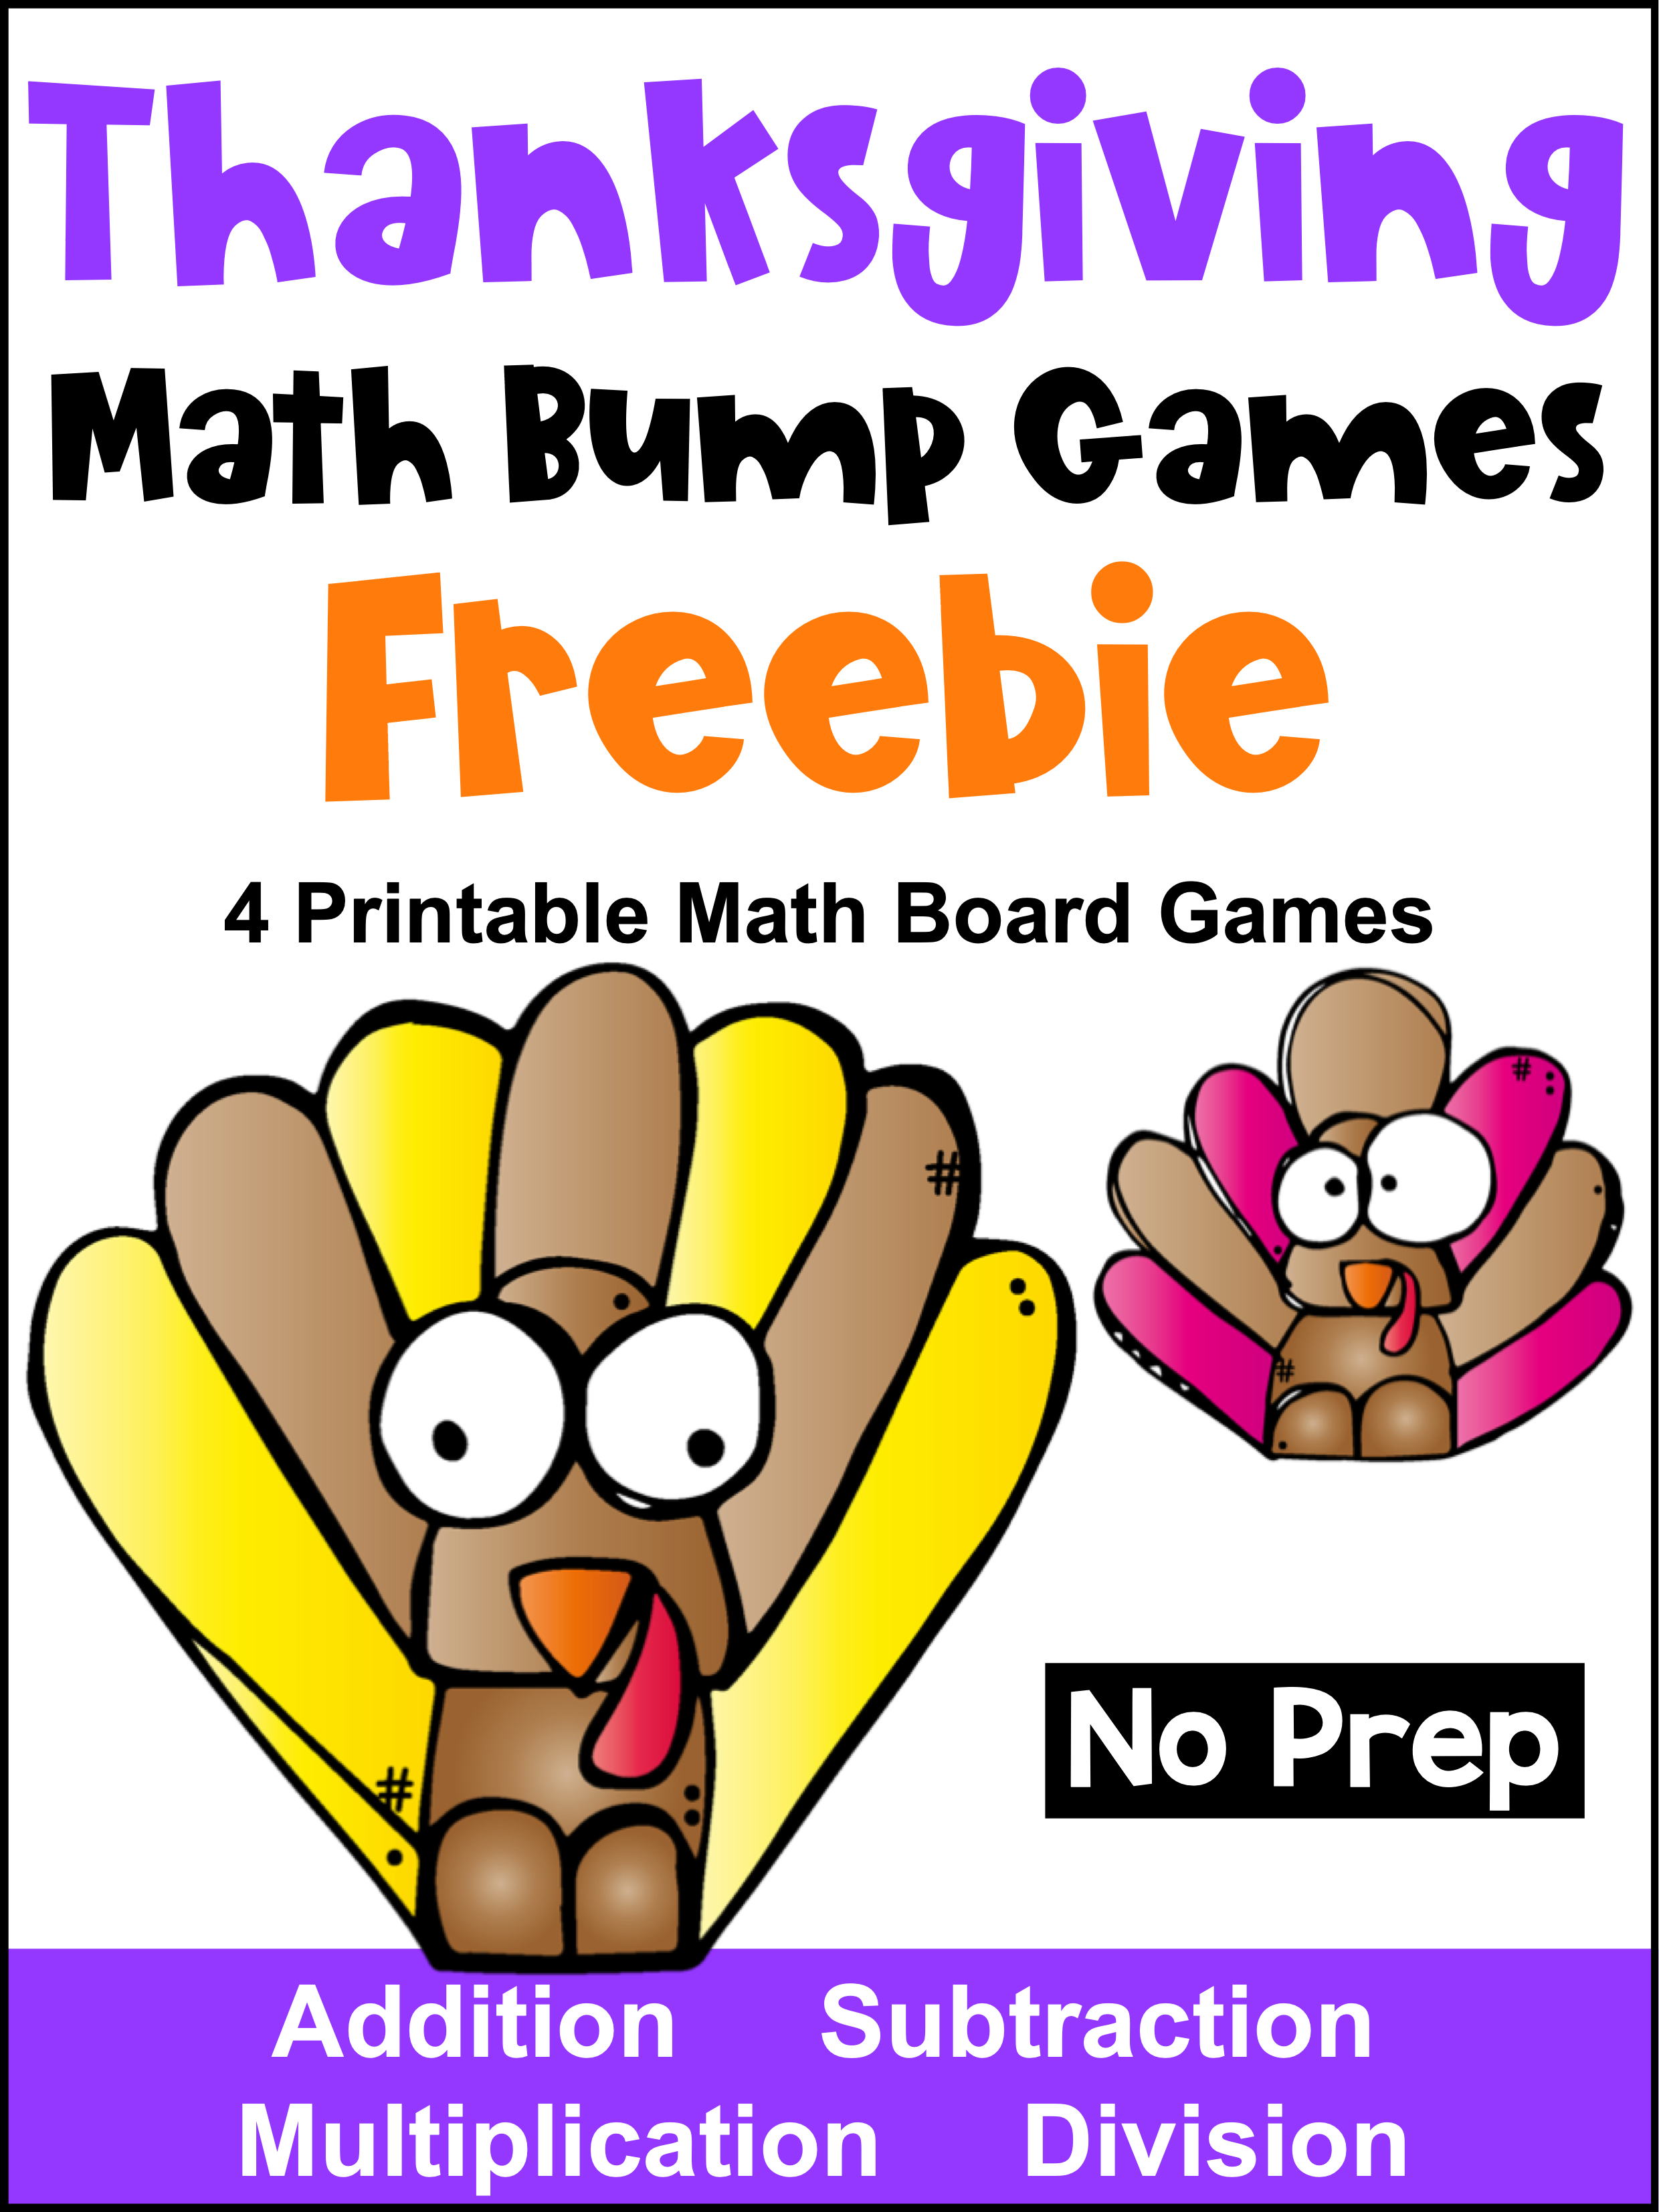 Free Thanksgiving Math Games Thanksgiving Math Activities Thanksgiving Math Thanksgiving Math Games